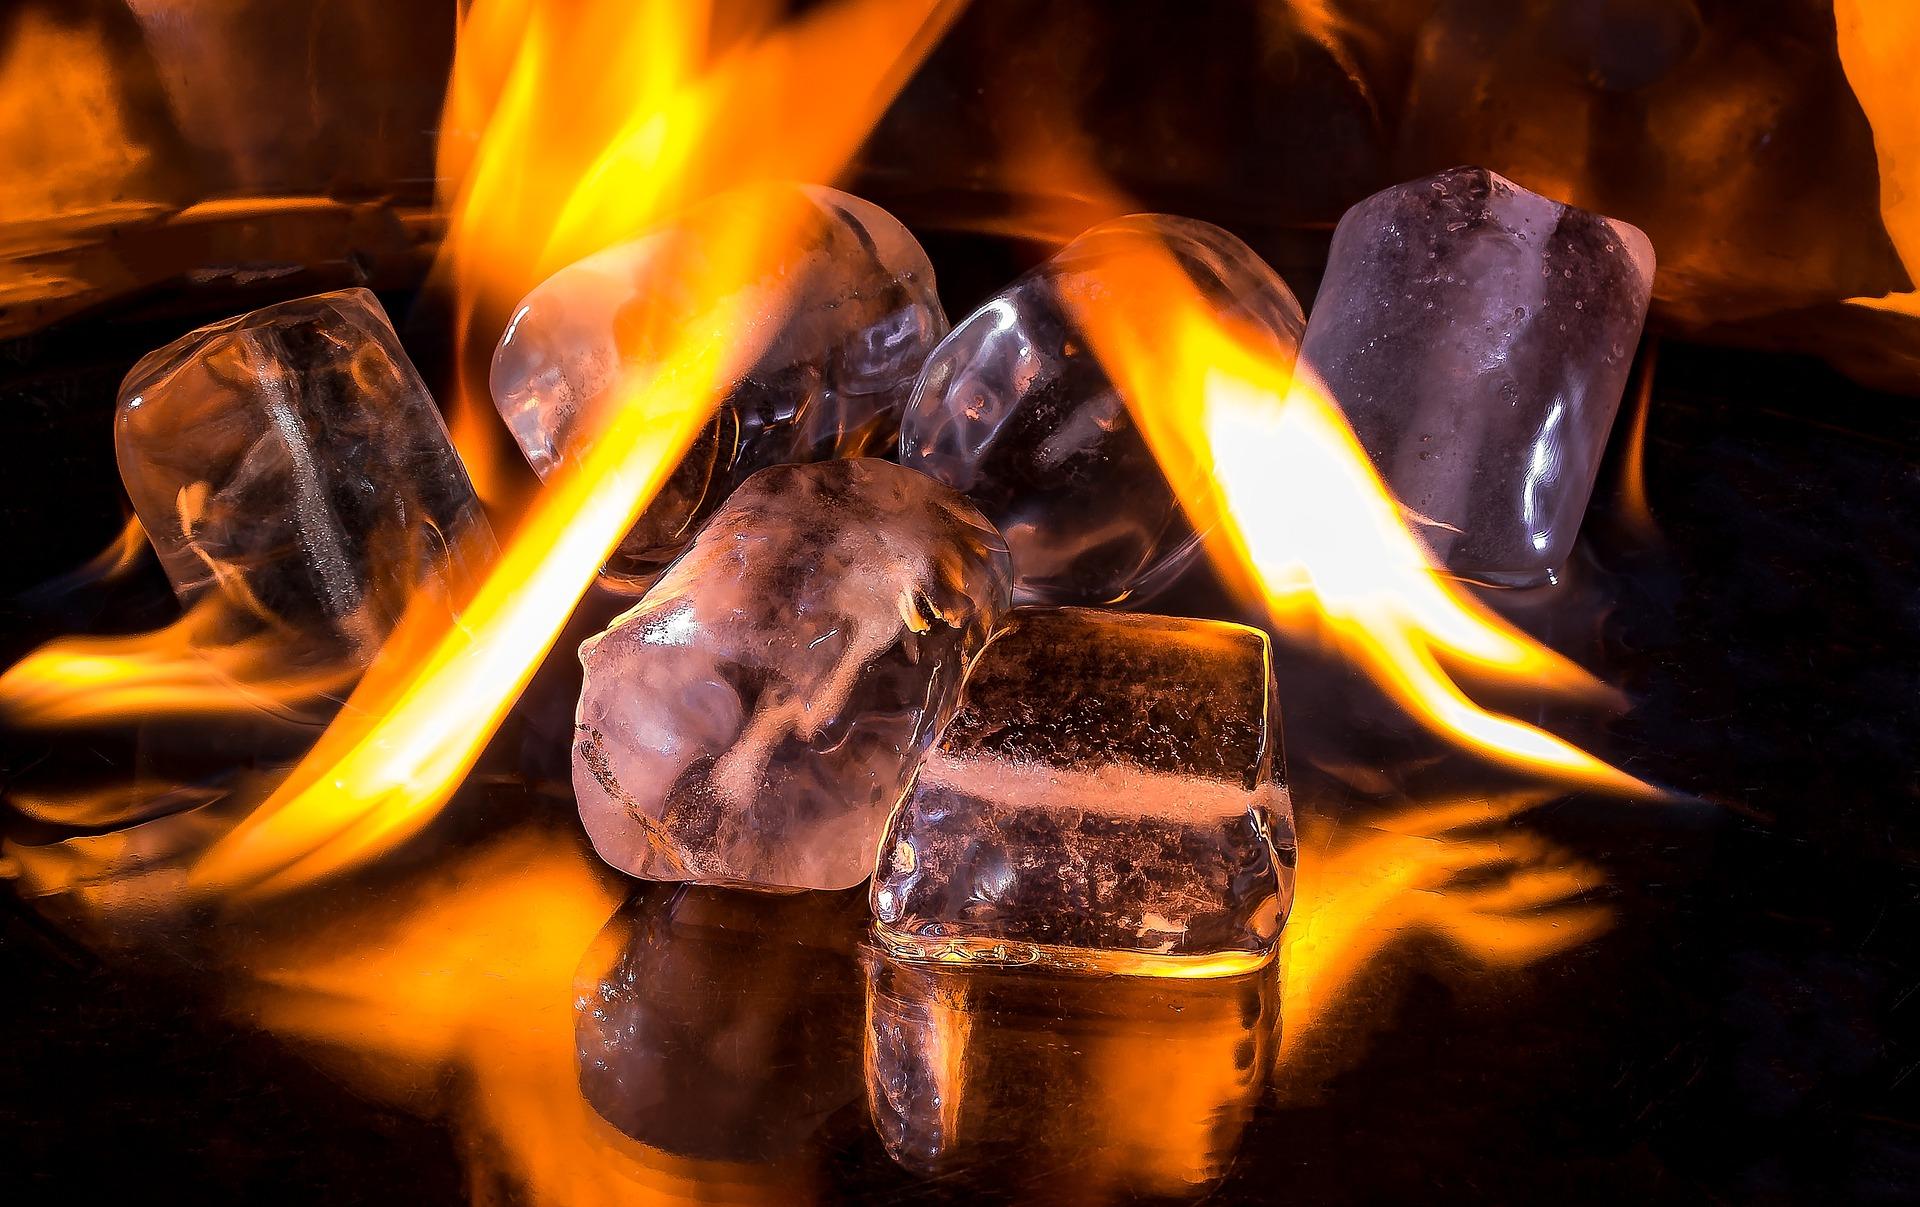 Eiswürfel in Flammen